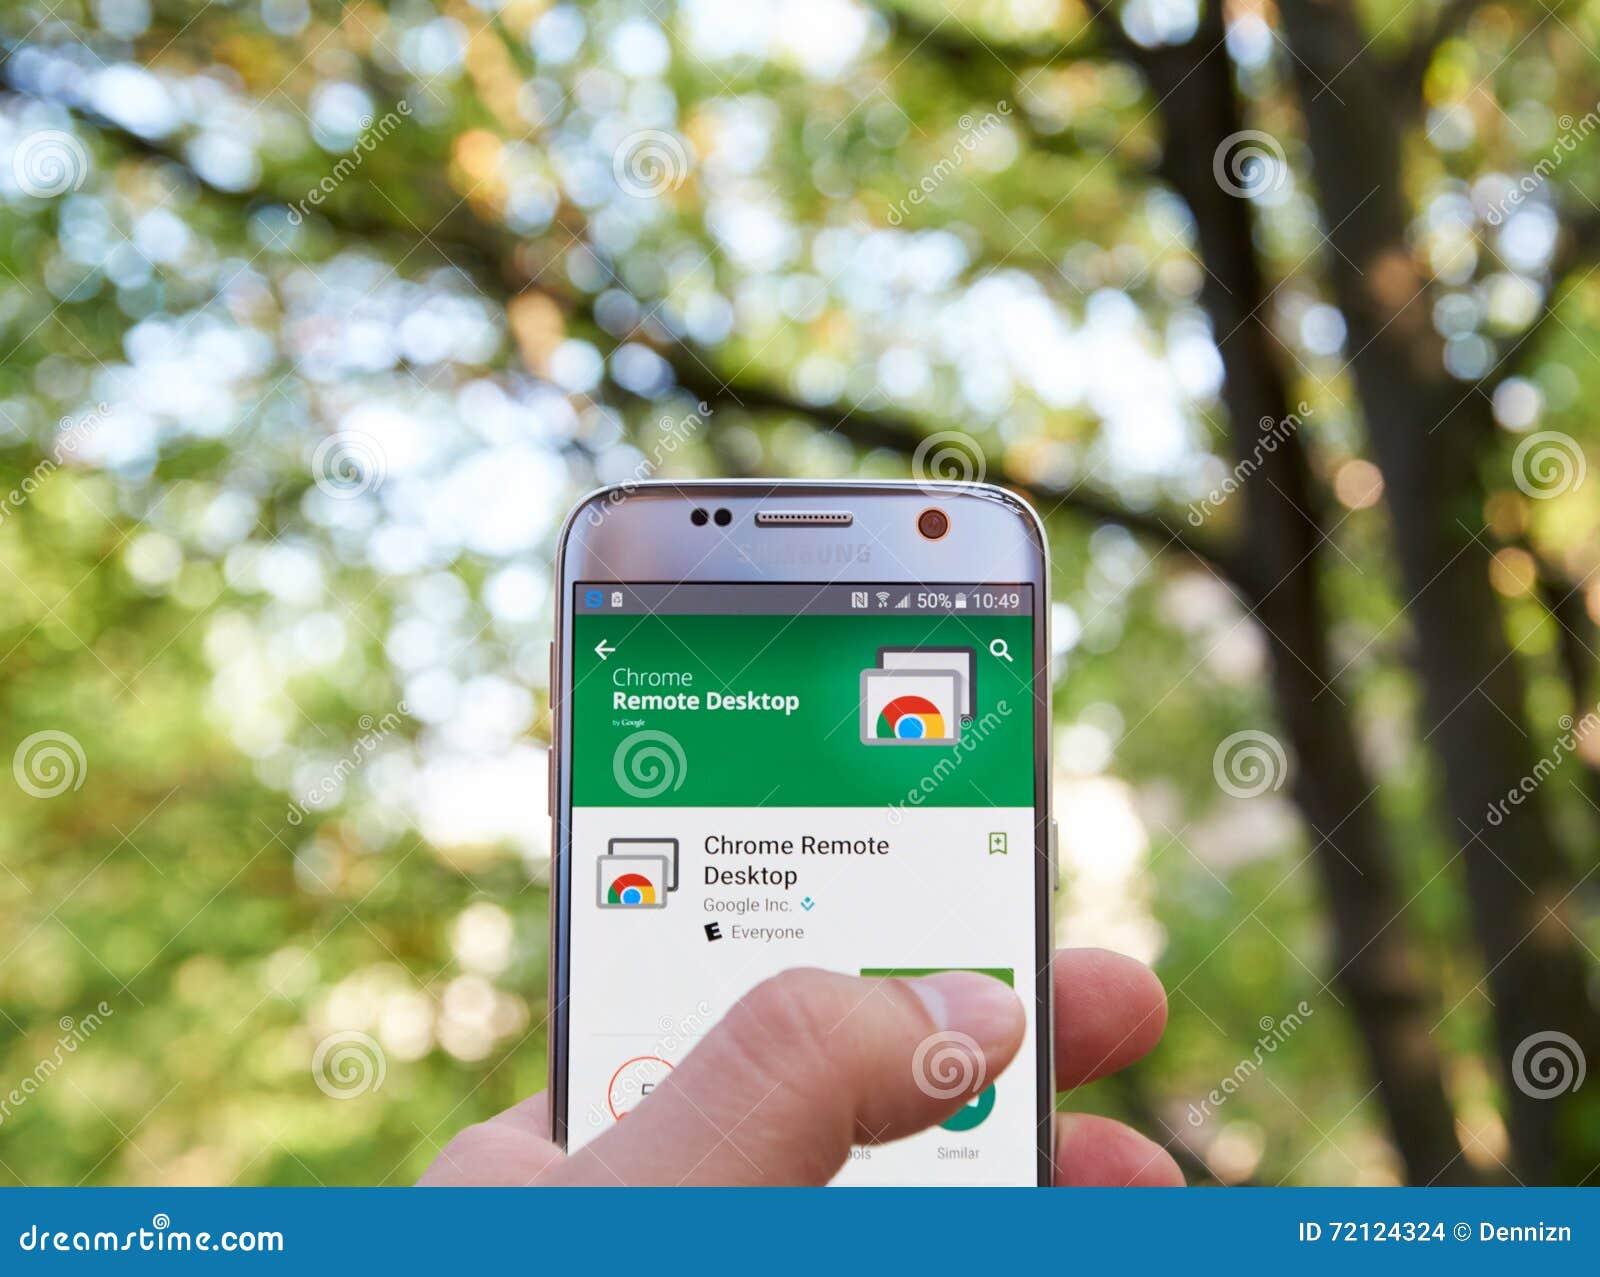 Google Chrome Remote Desktop App Editorial Stock Image